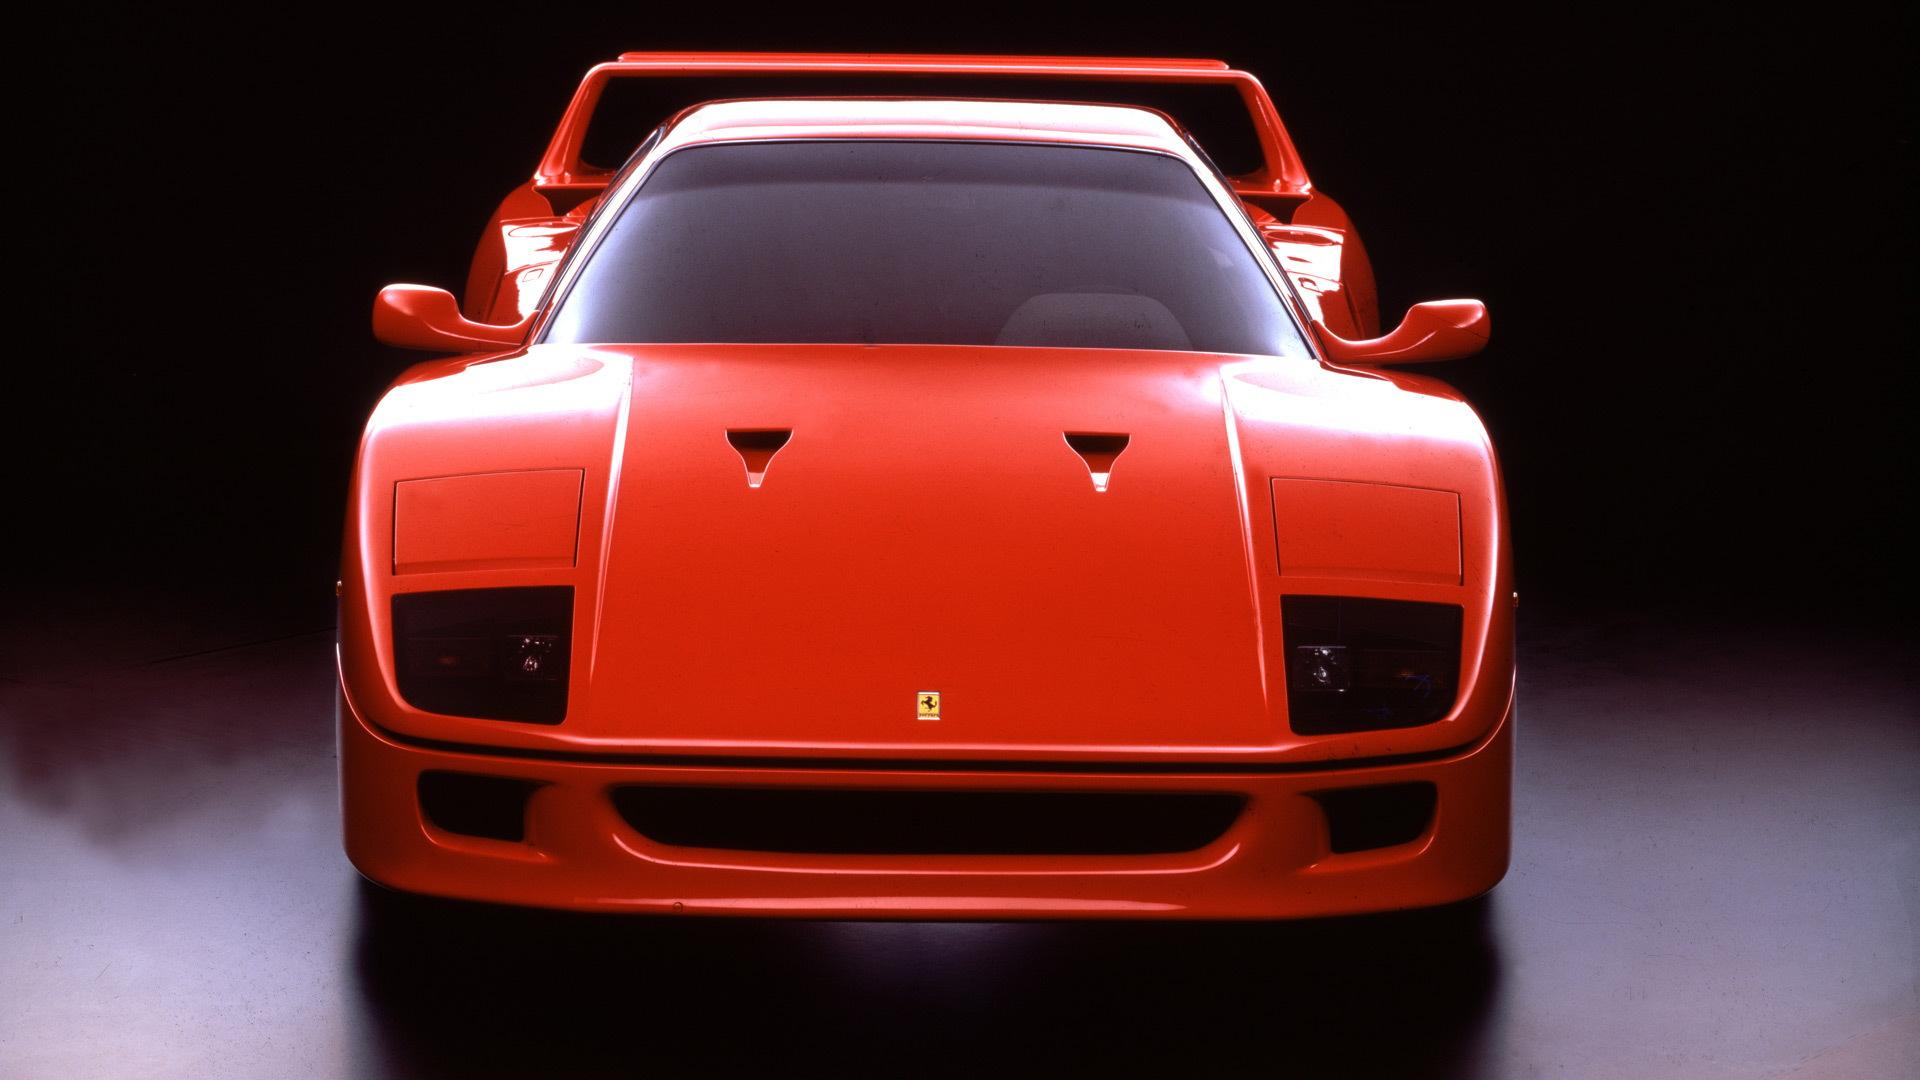 Ferrari F40 debut - July 21, 1987